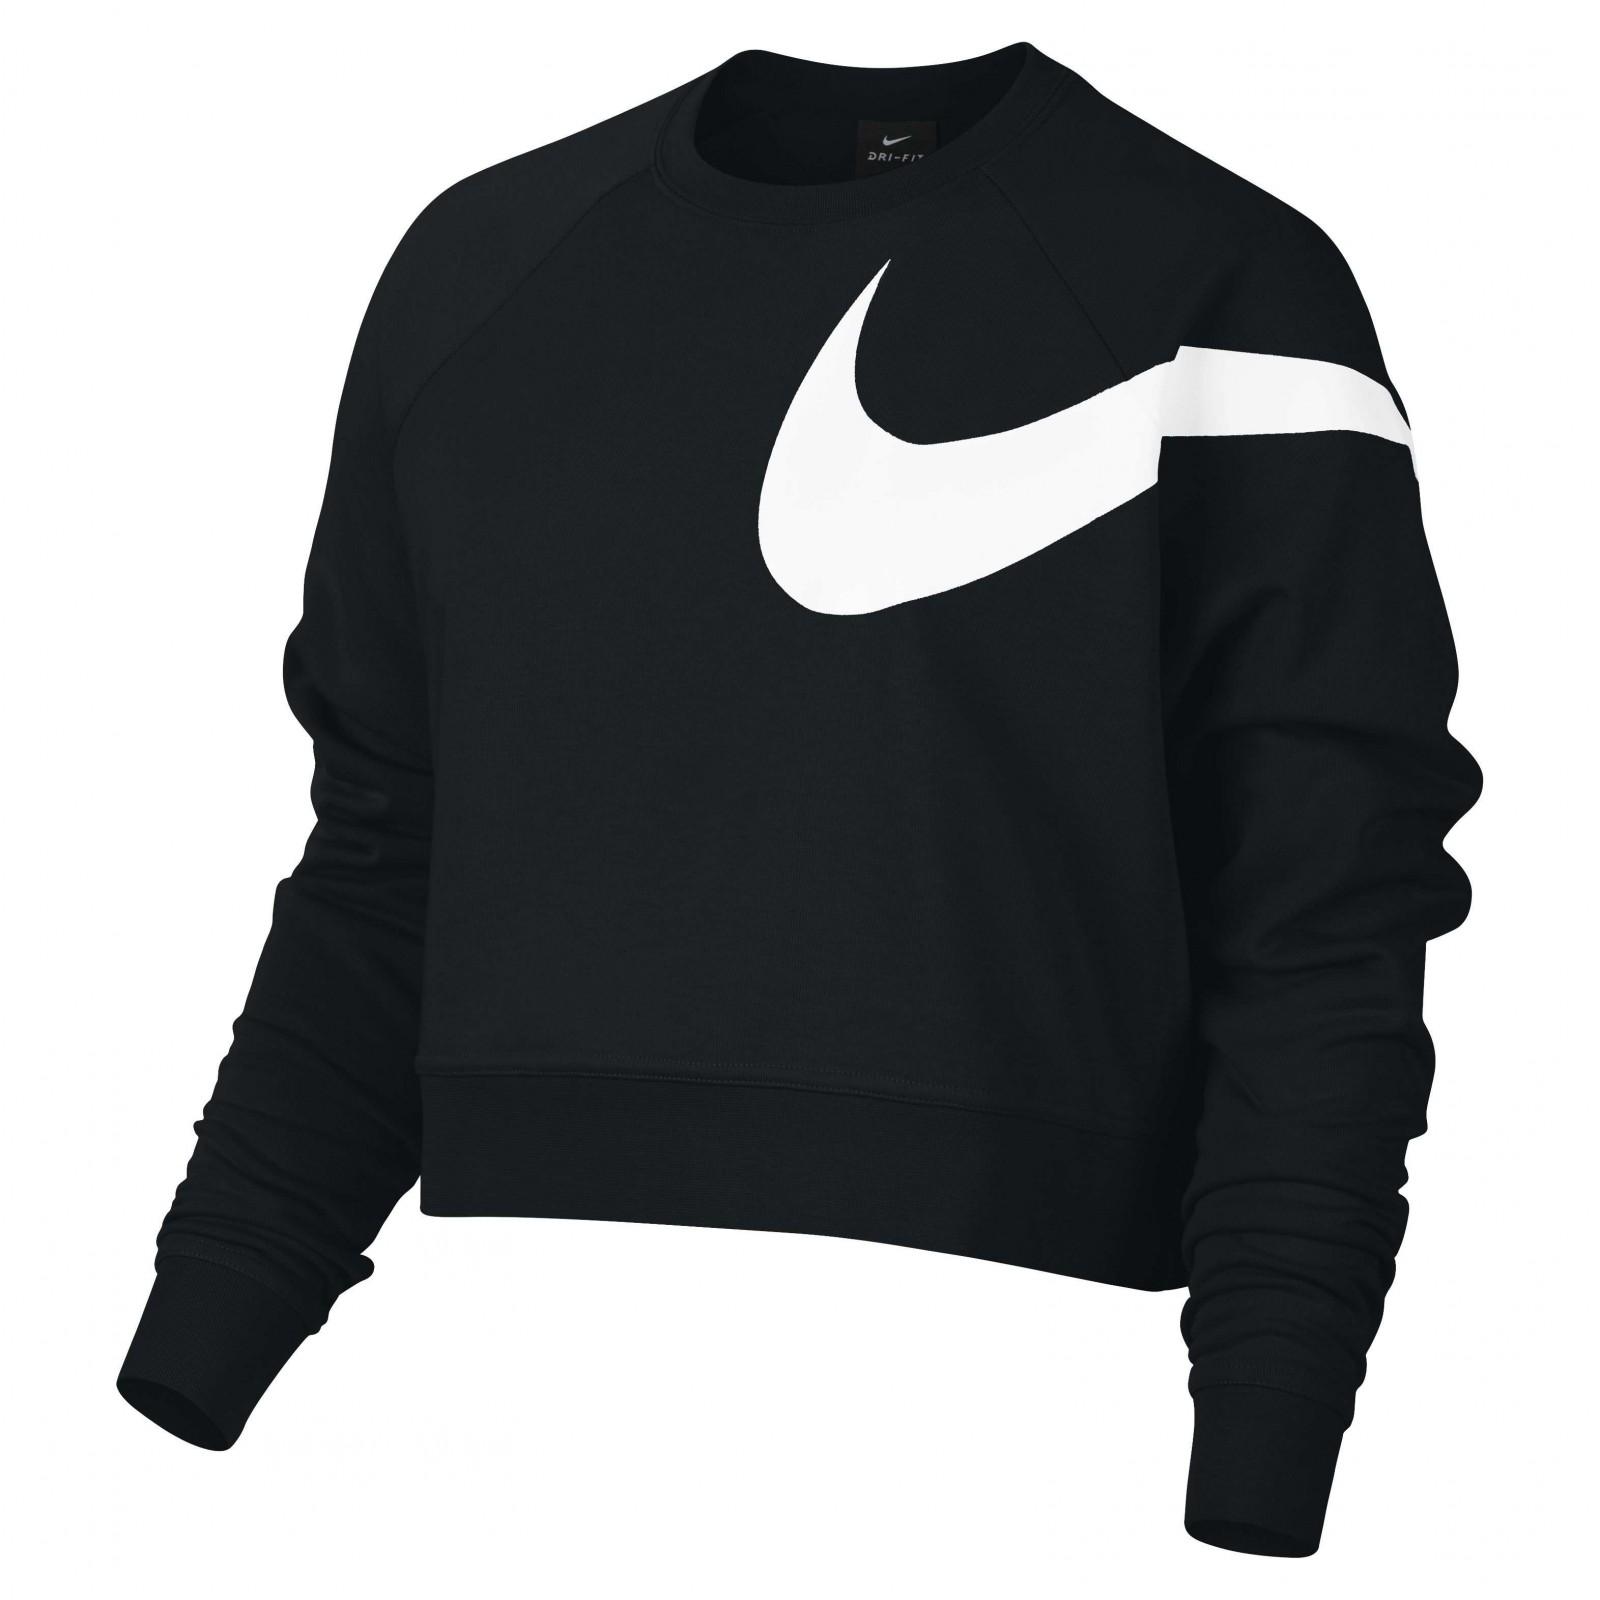 a96f8d9cb433 Dámské tričko Nike W NK DRY TOP LS LG GPX VERSA